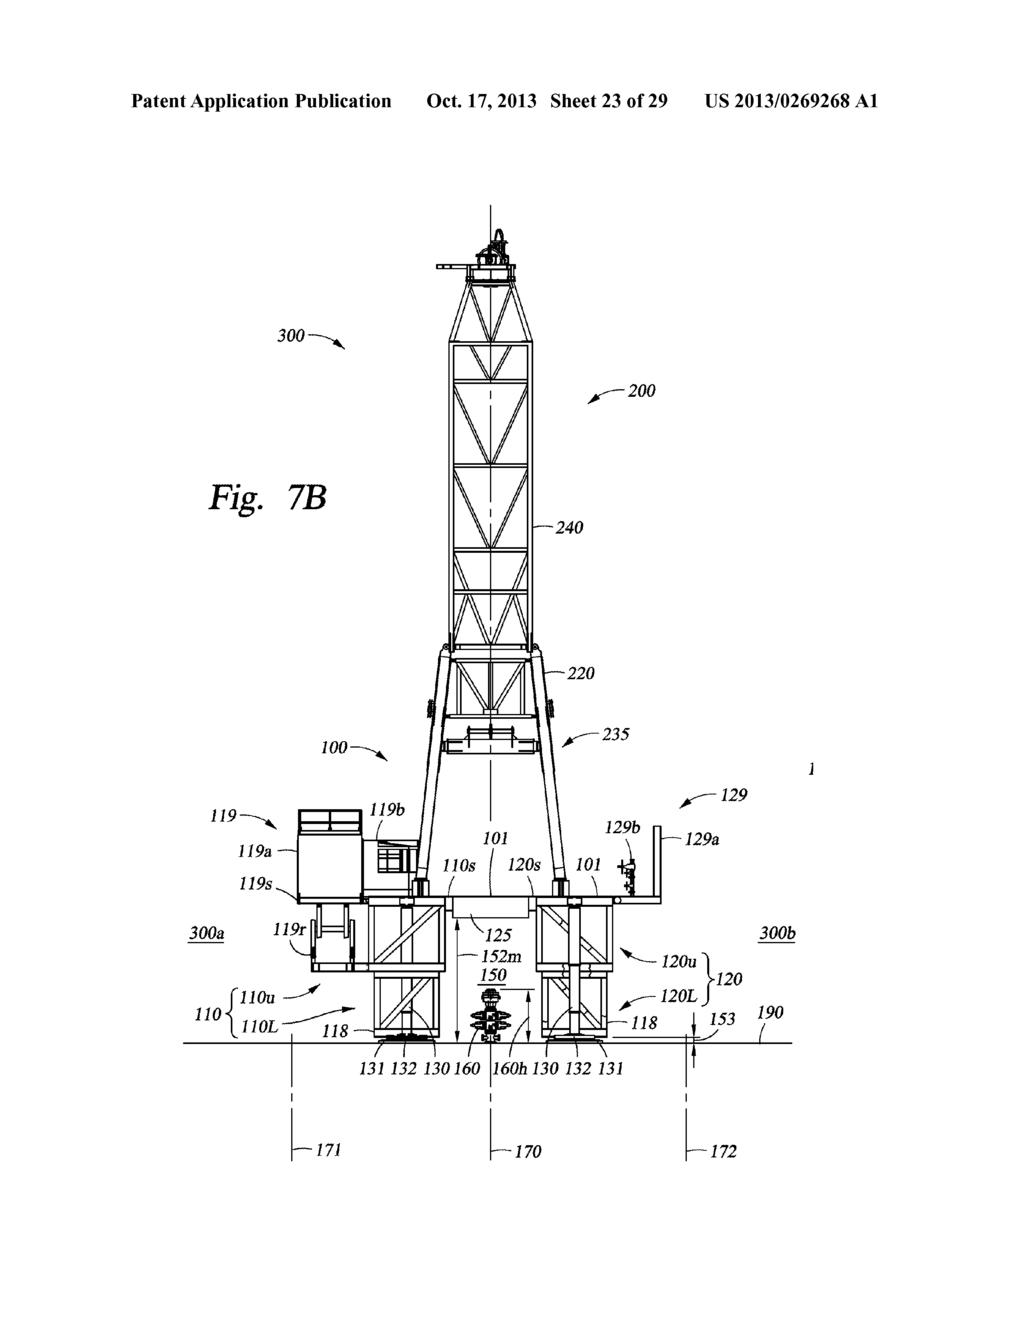 Mobile Drill Rig Diagram Auto Electrical Wiring Diagram \u2022 Diagram Of  Gas Well Rig Oil And Gas Rig Diagram